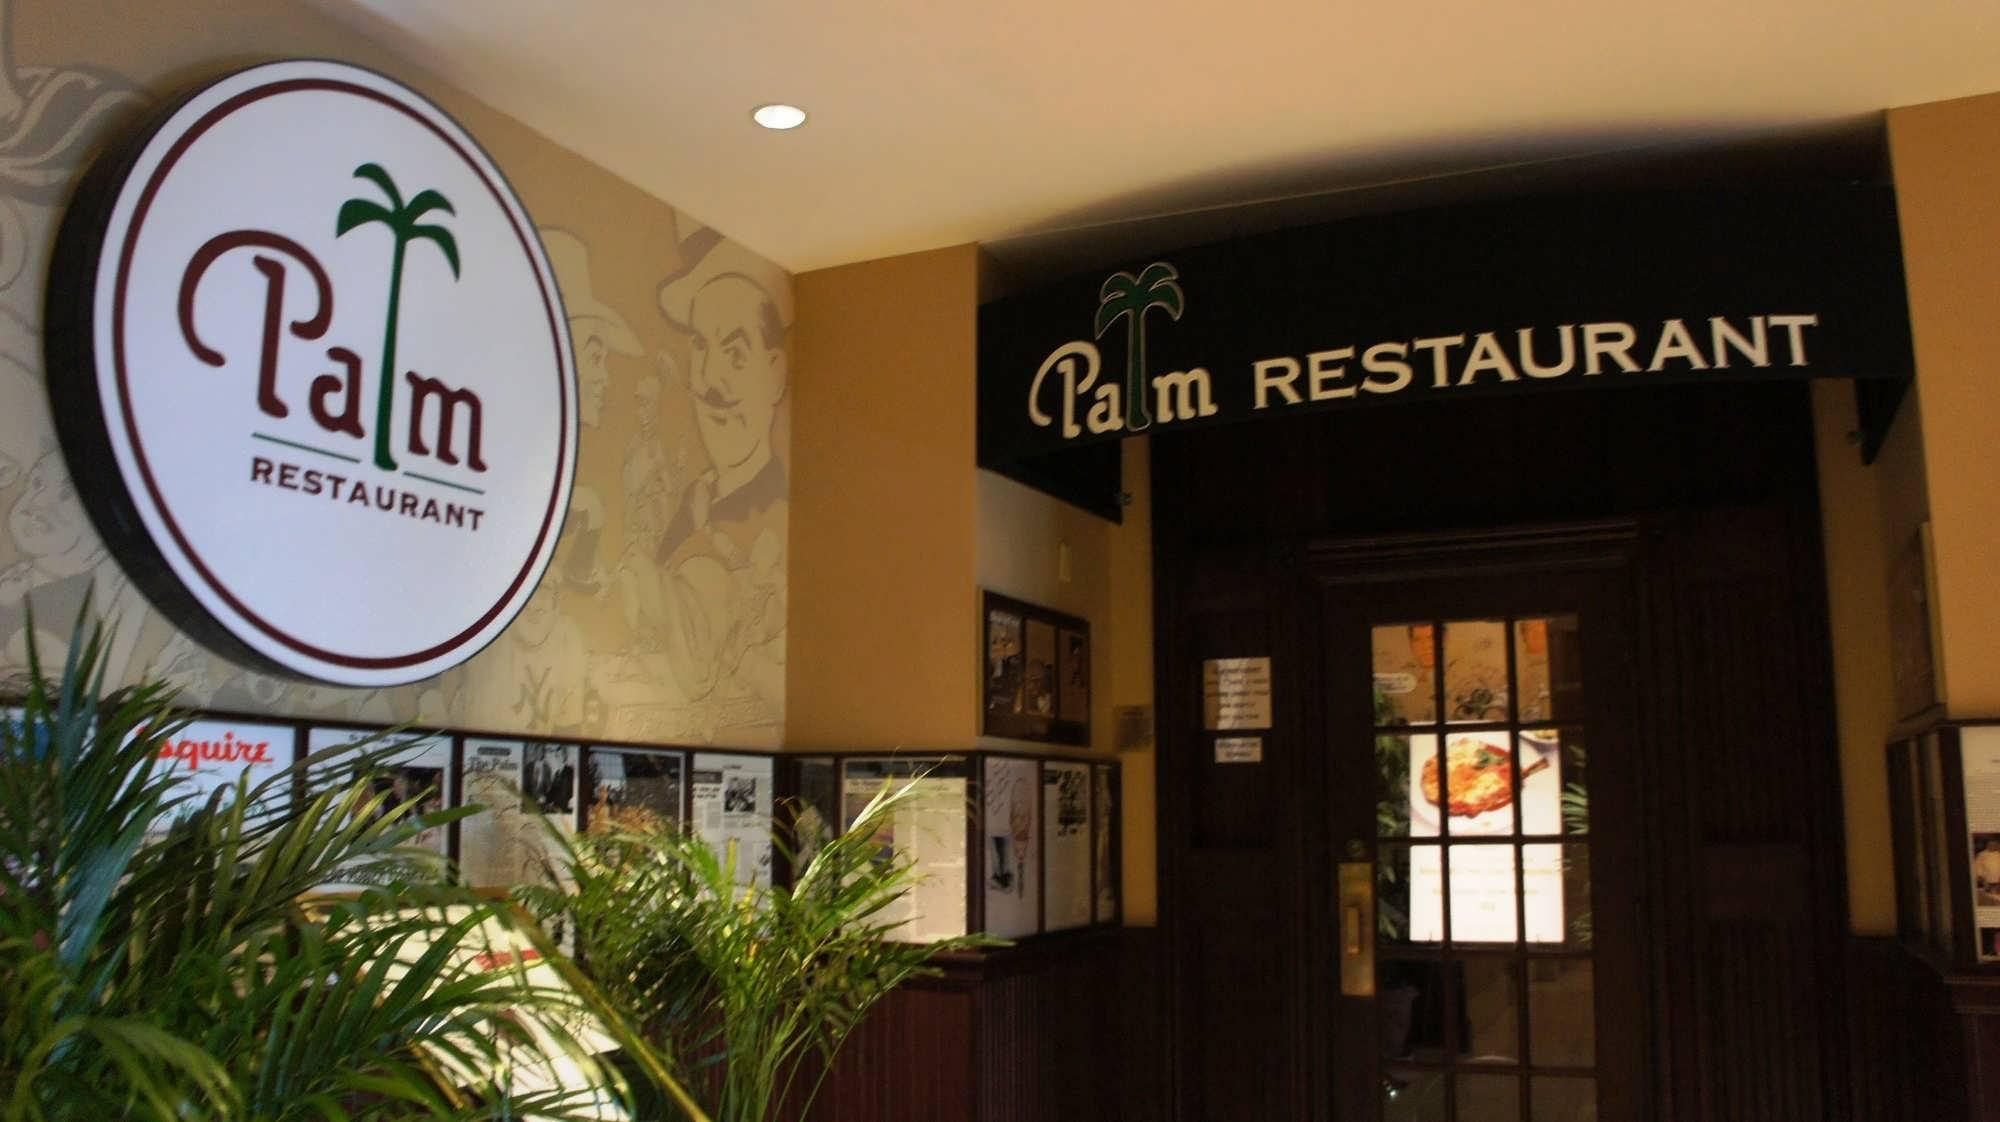 Hard Rock Hotel's Palm Restaurant